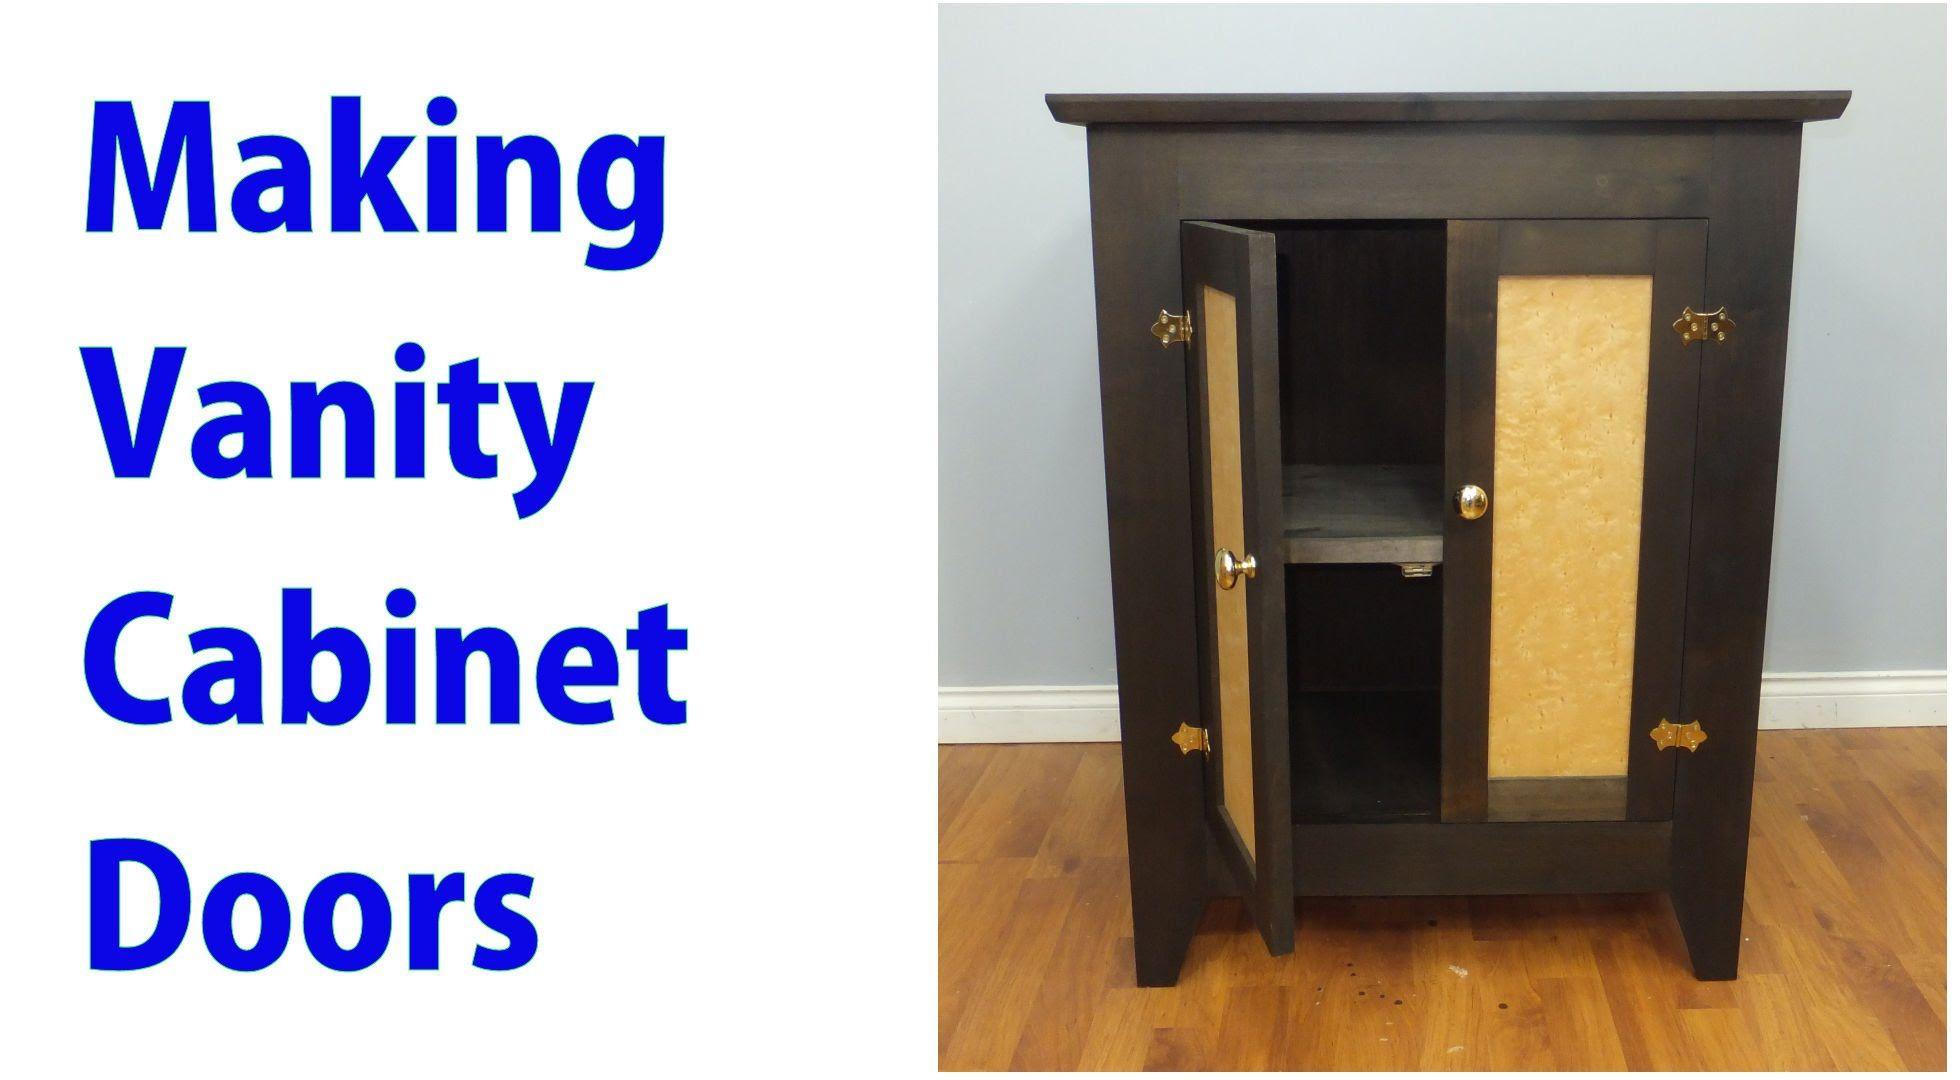 How to make vanity doors vanity